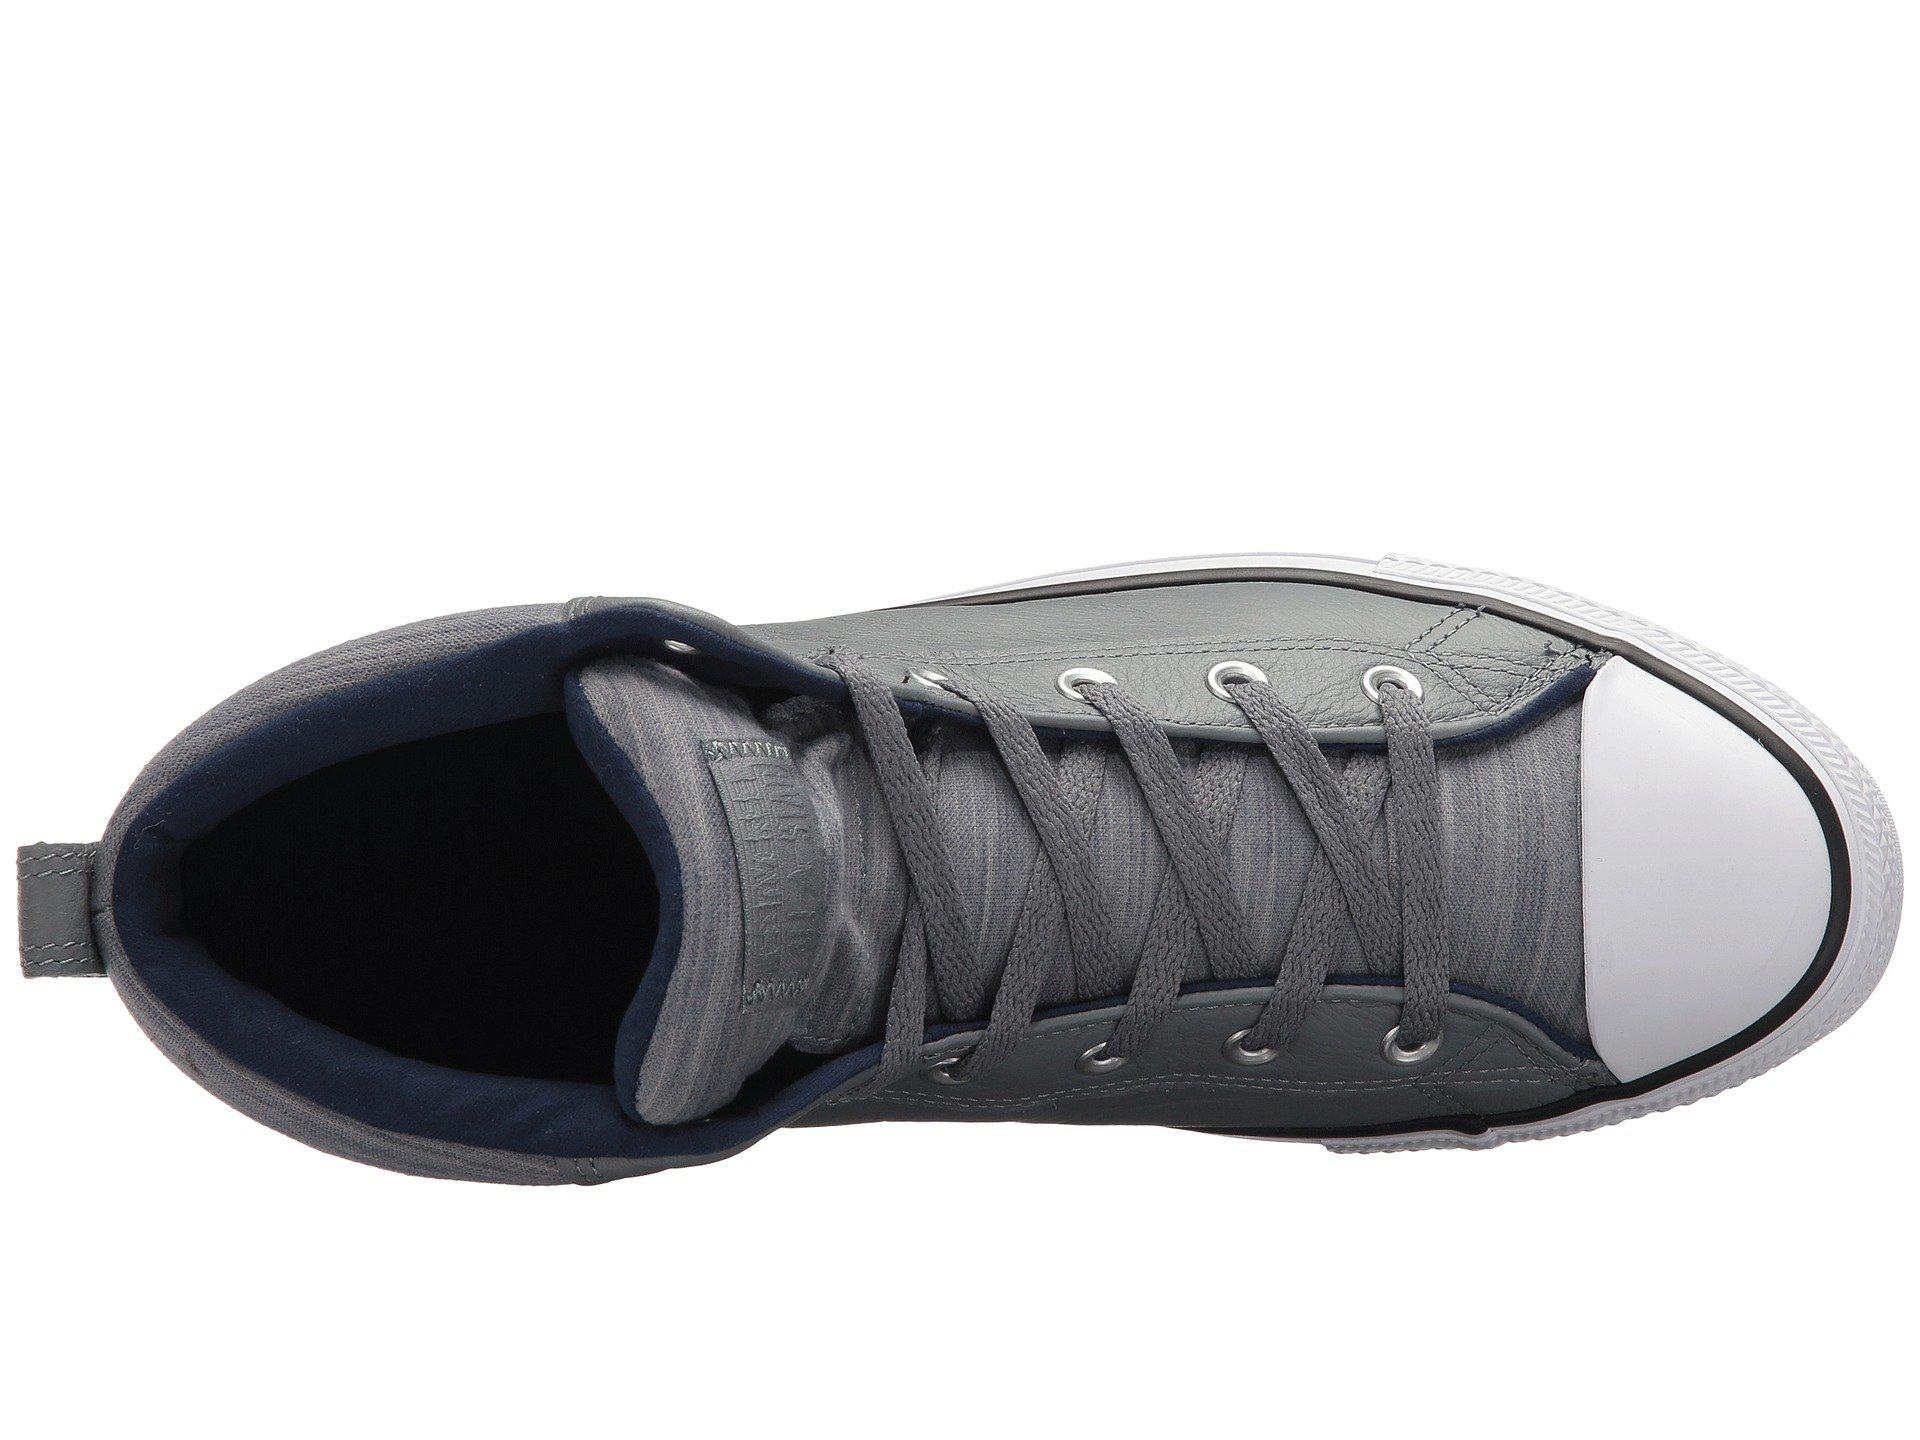 55b29662171 Lyst - Converse Chuck Taylor® All Star® High Street Leather W ...